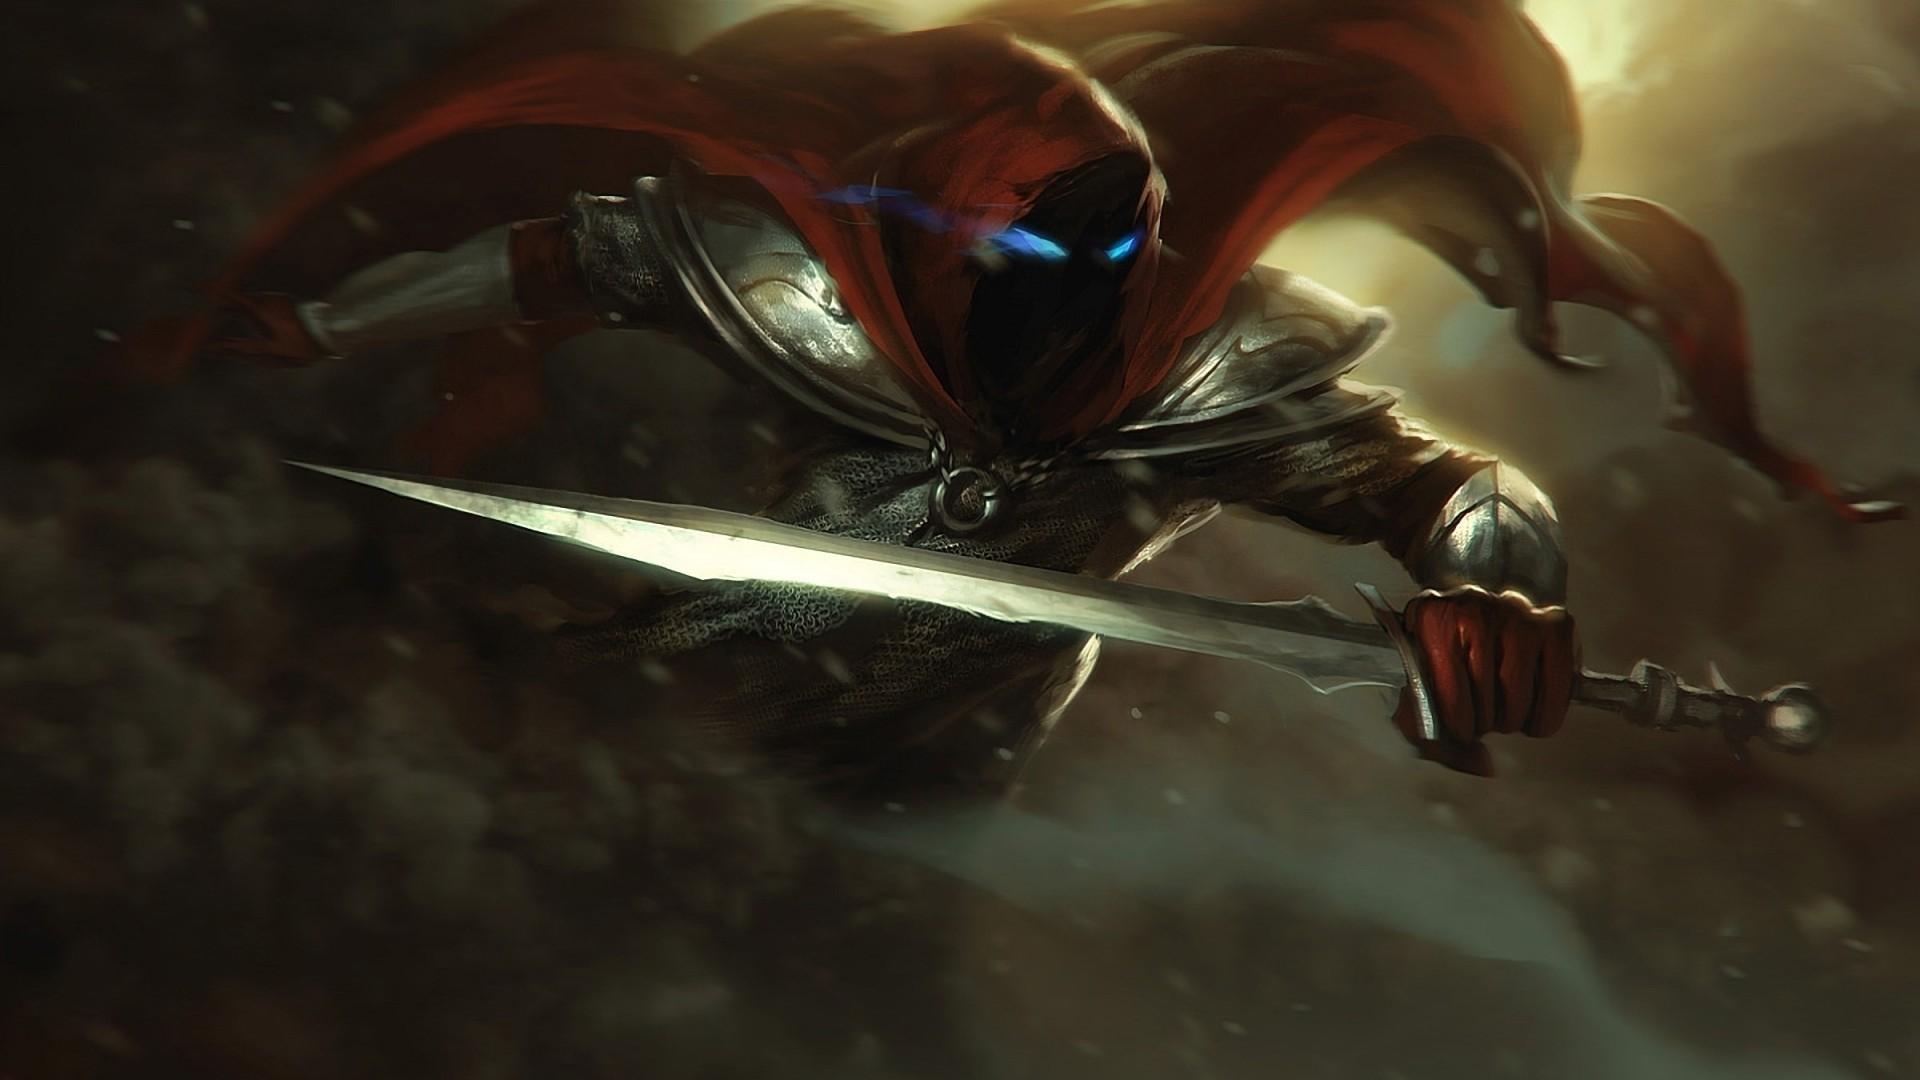 Res: 1920x1080, Evil-Ryu-Blue-Eyes-Assassins-Hd-Smashing-1920×1080-wallpaper-wpt7209948